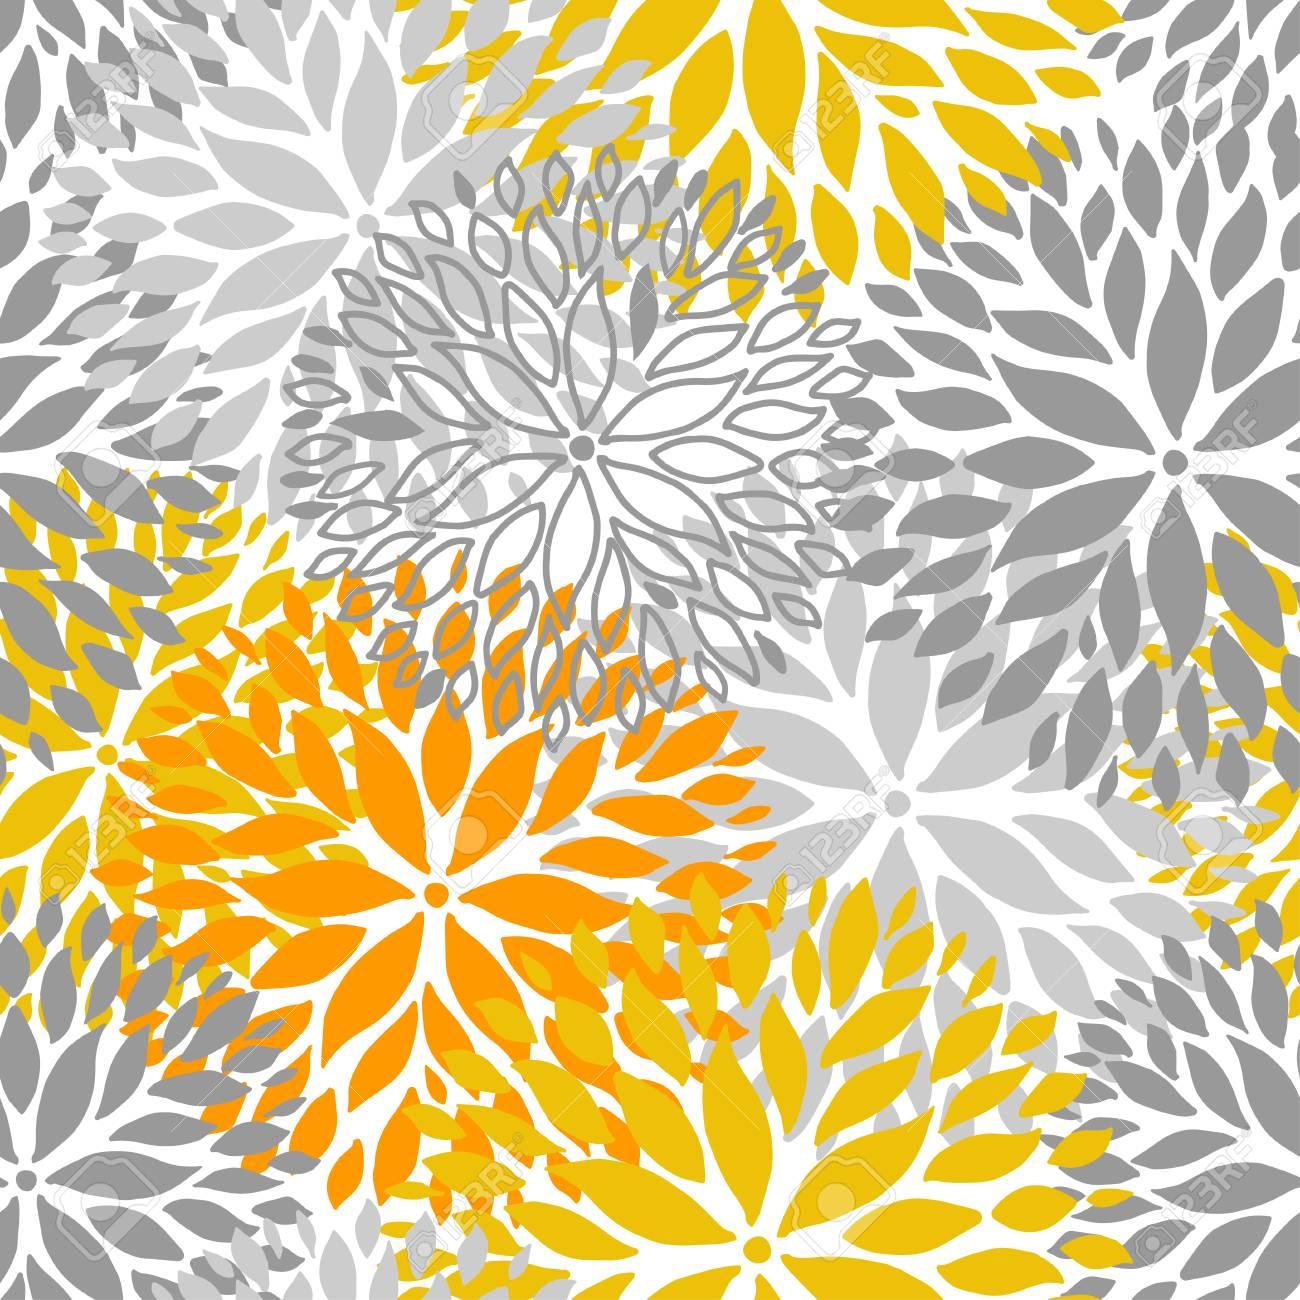 Orange and grey flower seamless pattern chrisanthemum flowers orange and grey flower seamless pattern chrisanthemum flowers background for web print textile mightylinksfo